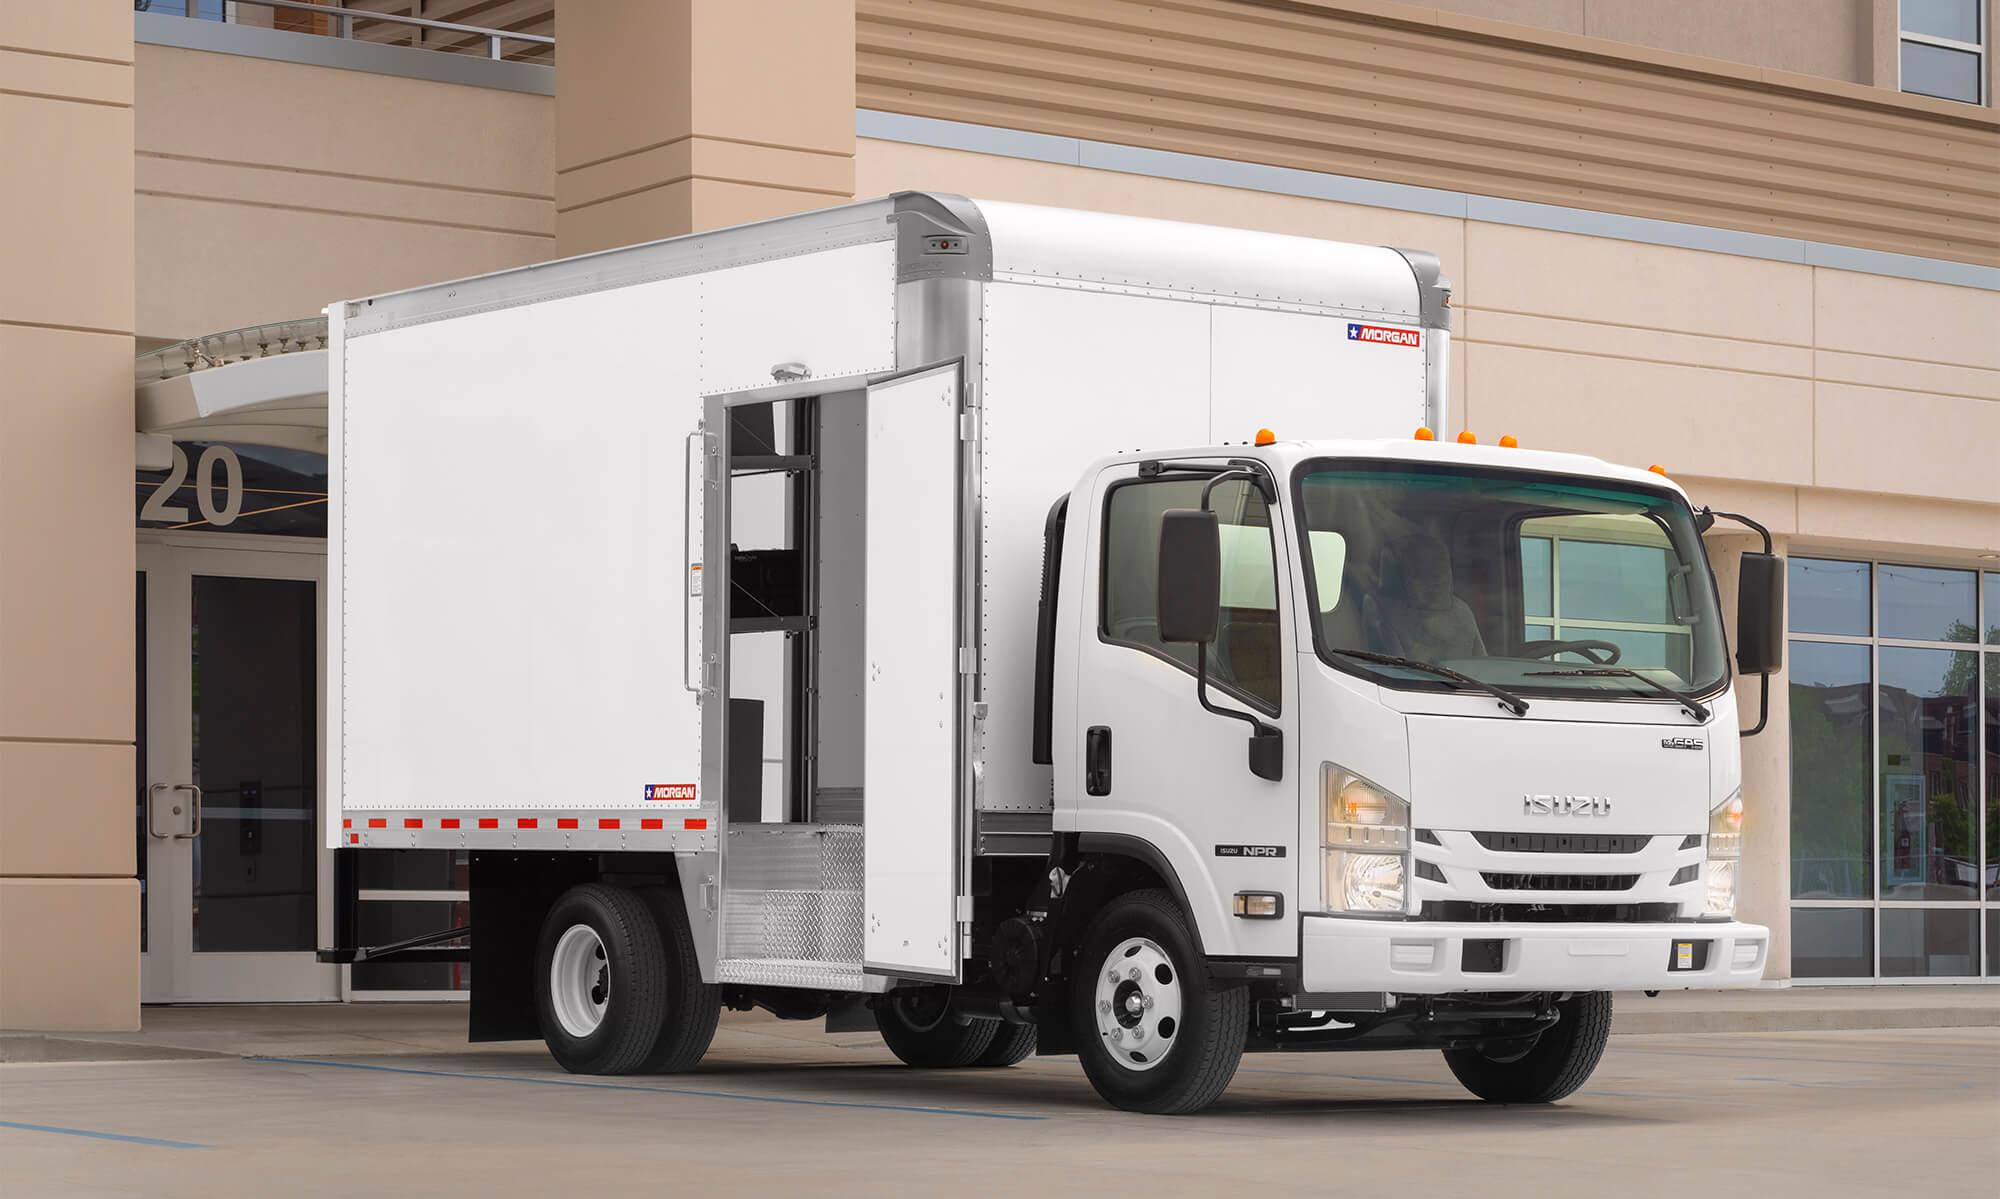 Morgan Corporation Home Delivery Truck Concept